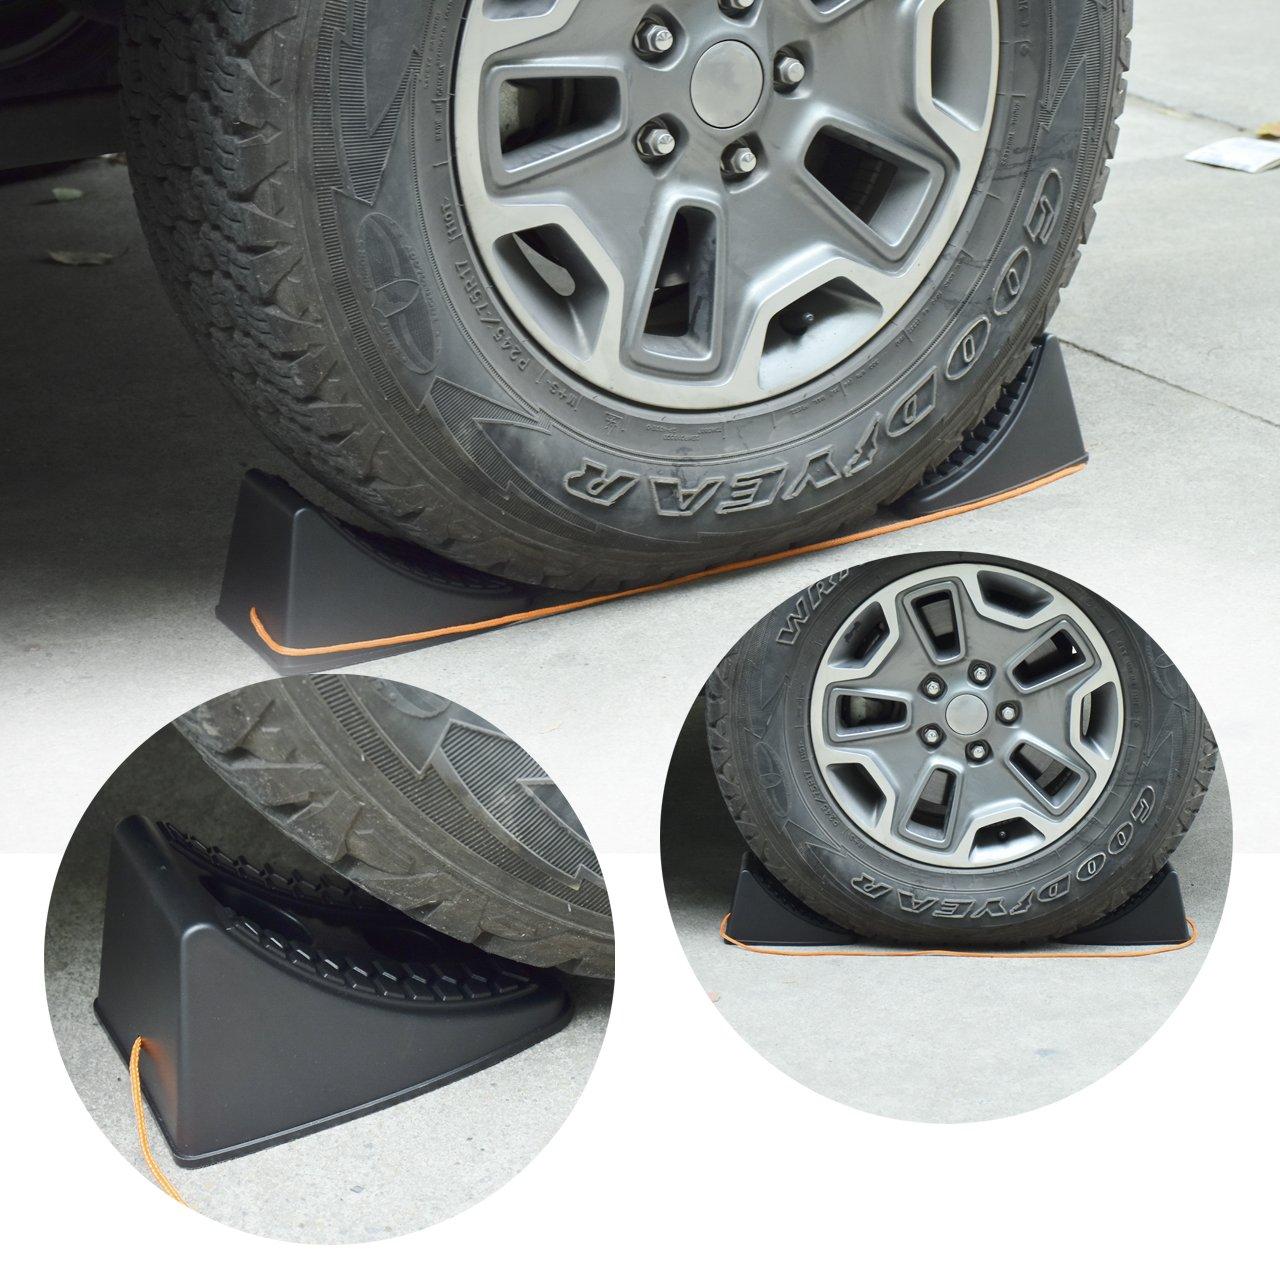 DEDC Heavy Duty Wheel Chocks for Caravan Car Wheel Stoppers Tire Chocks 4 Pack, RV Trailer ATV Truck Tire Wheel Blocks by DEDC (Image #4)